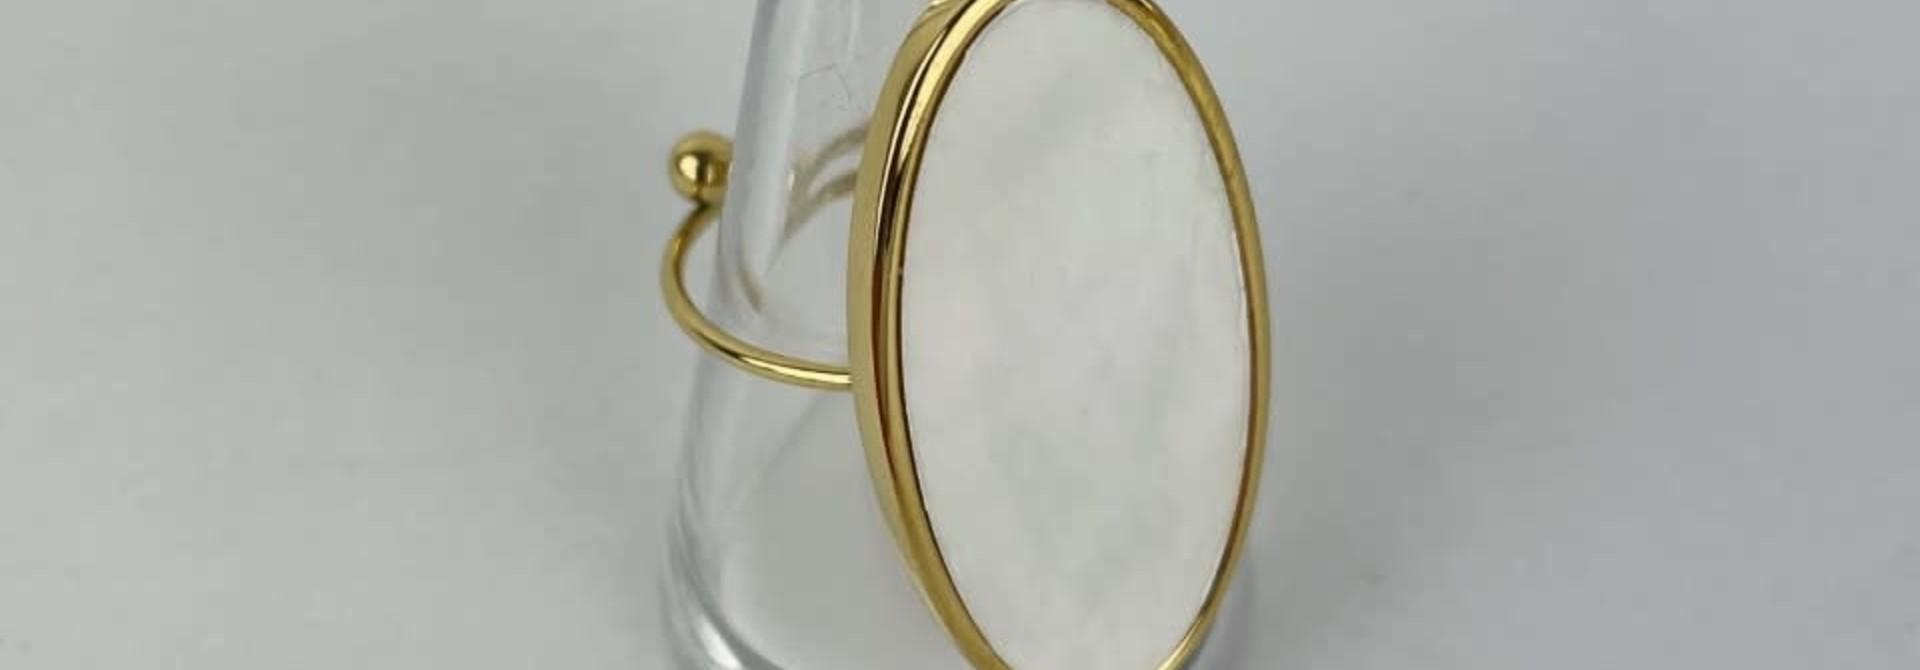 Vörhus oval Pearl White